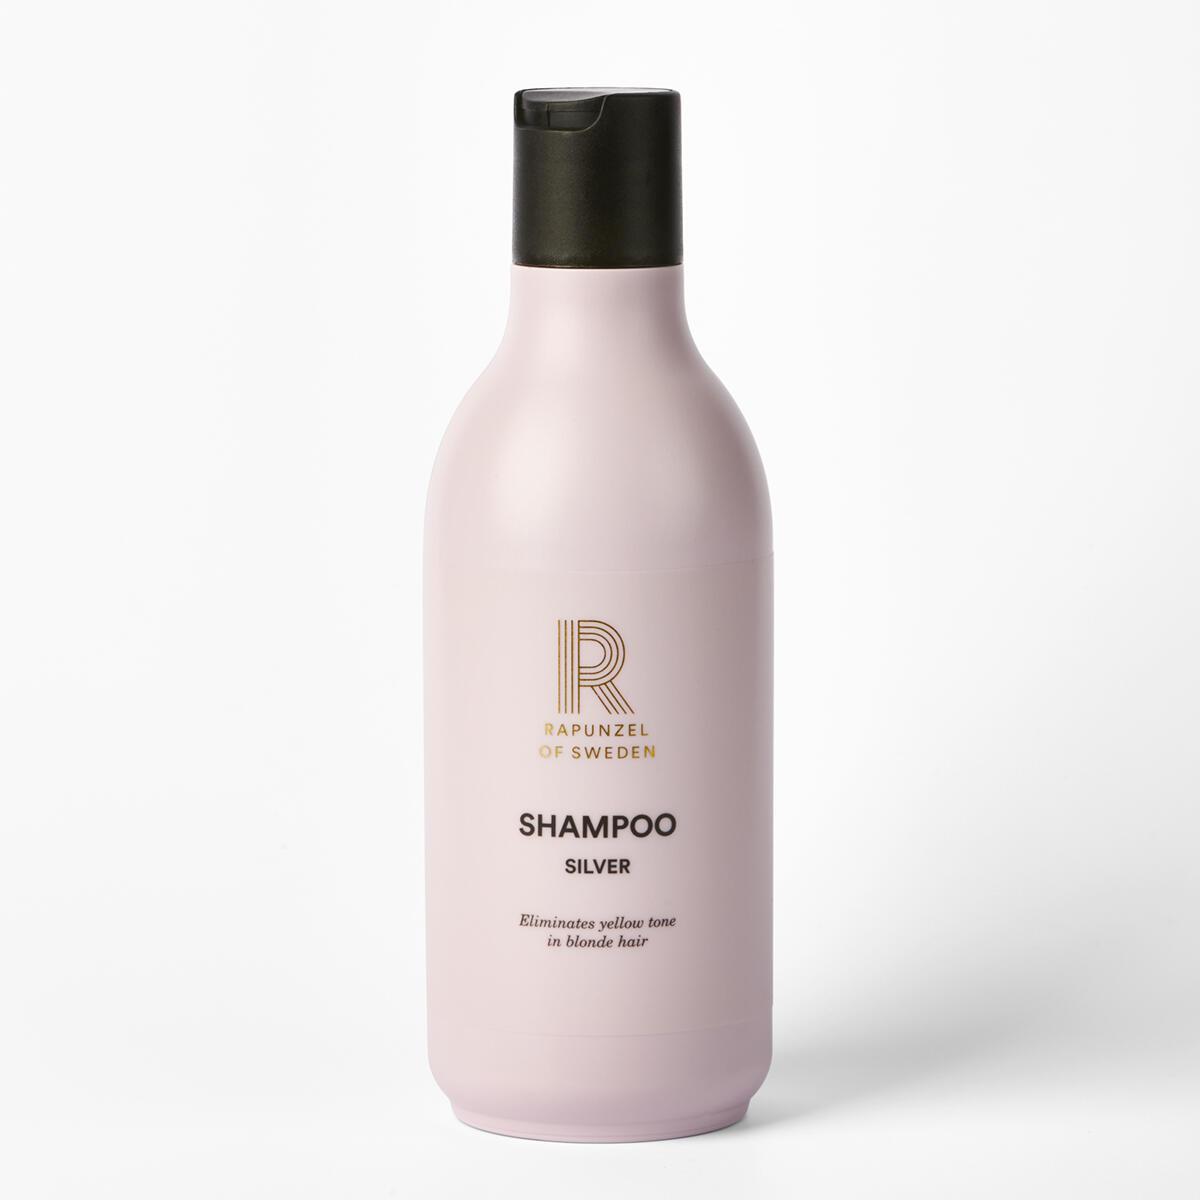 Silver Shampoo null